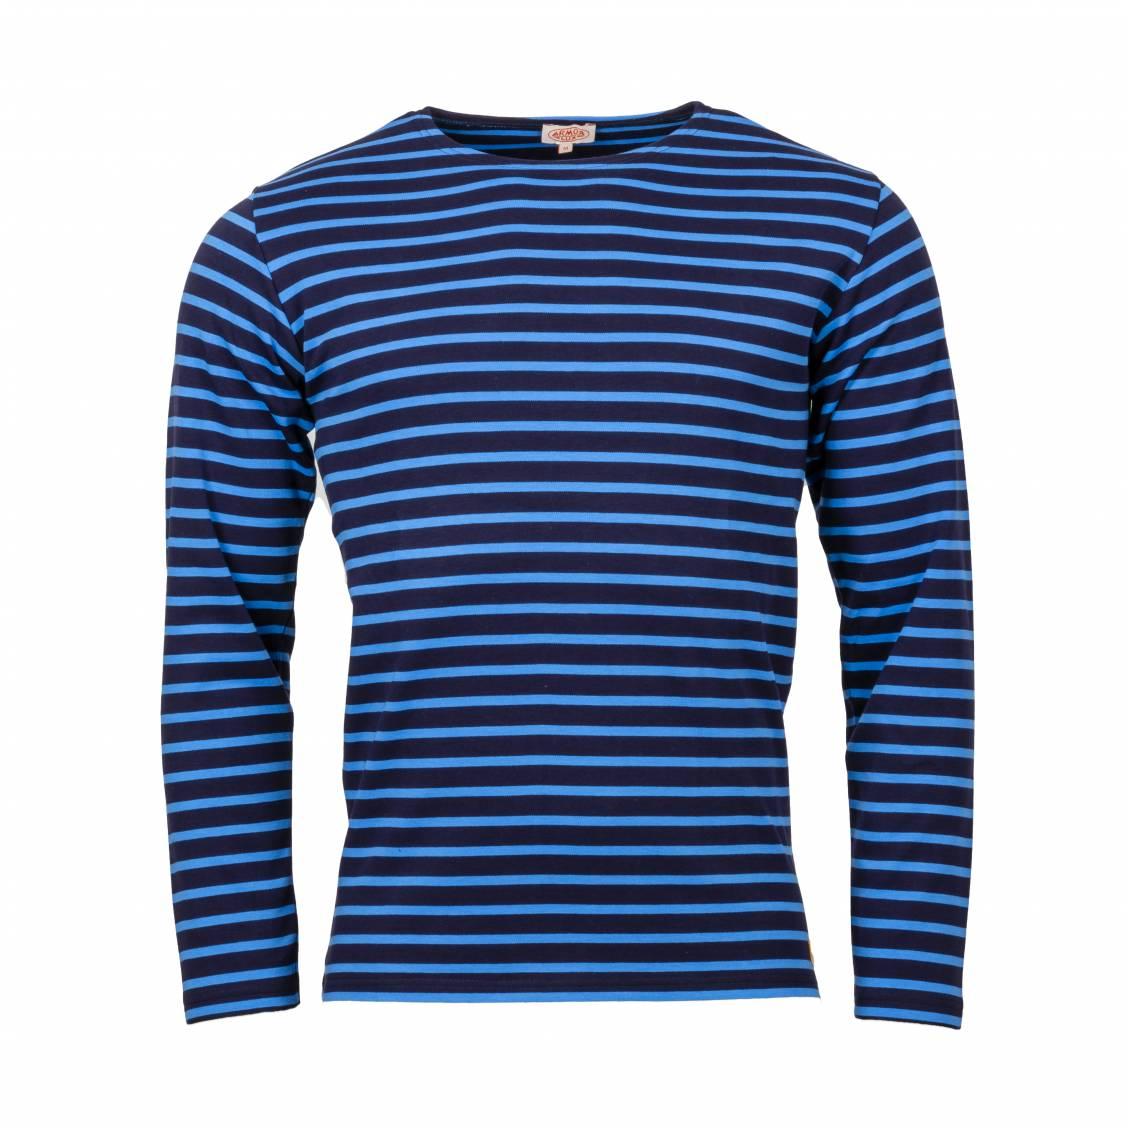 Tee-shirt 100% coton